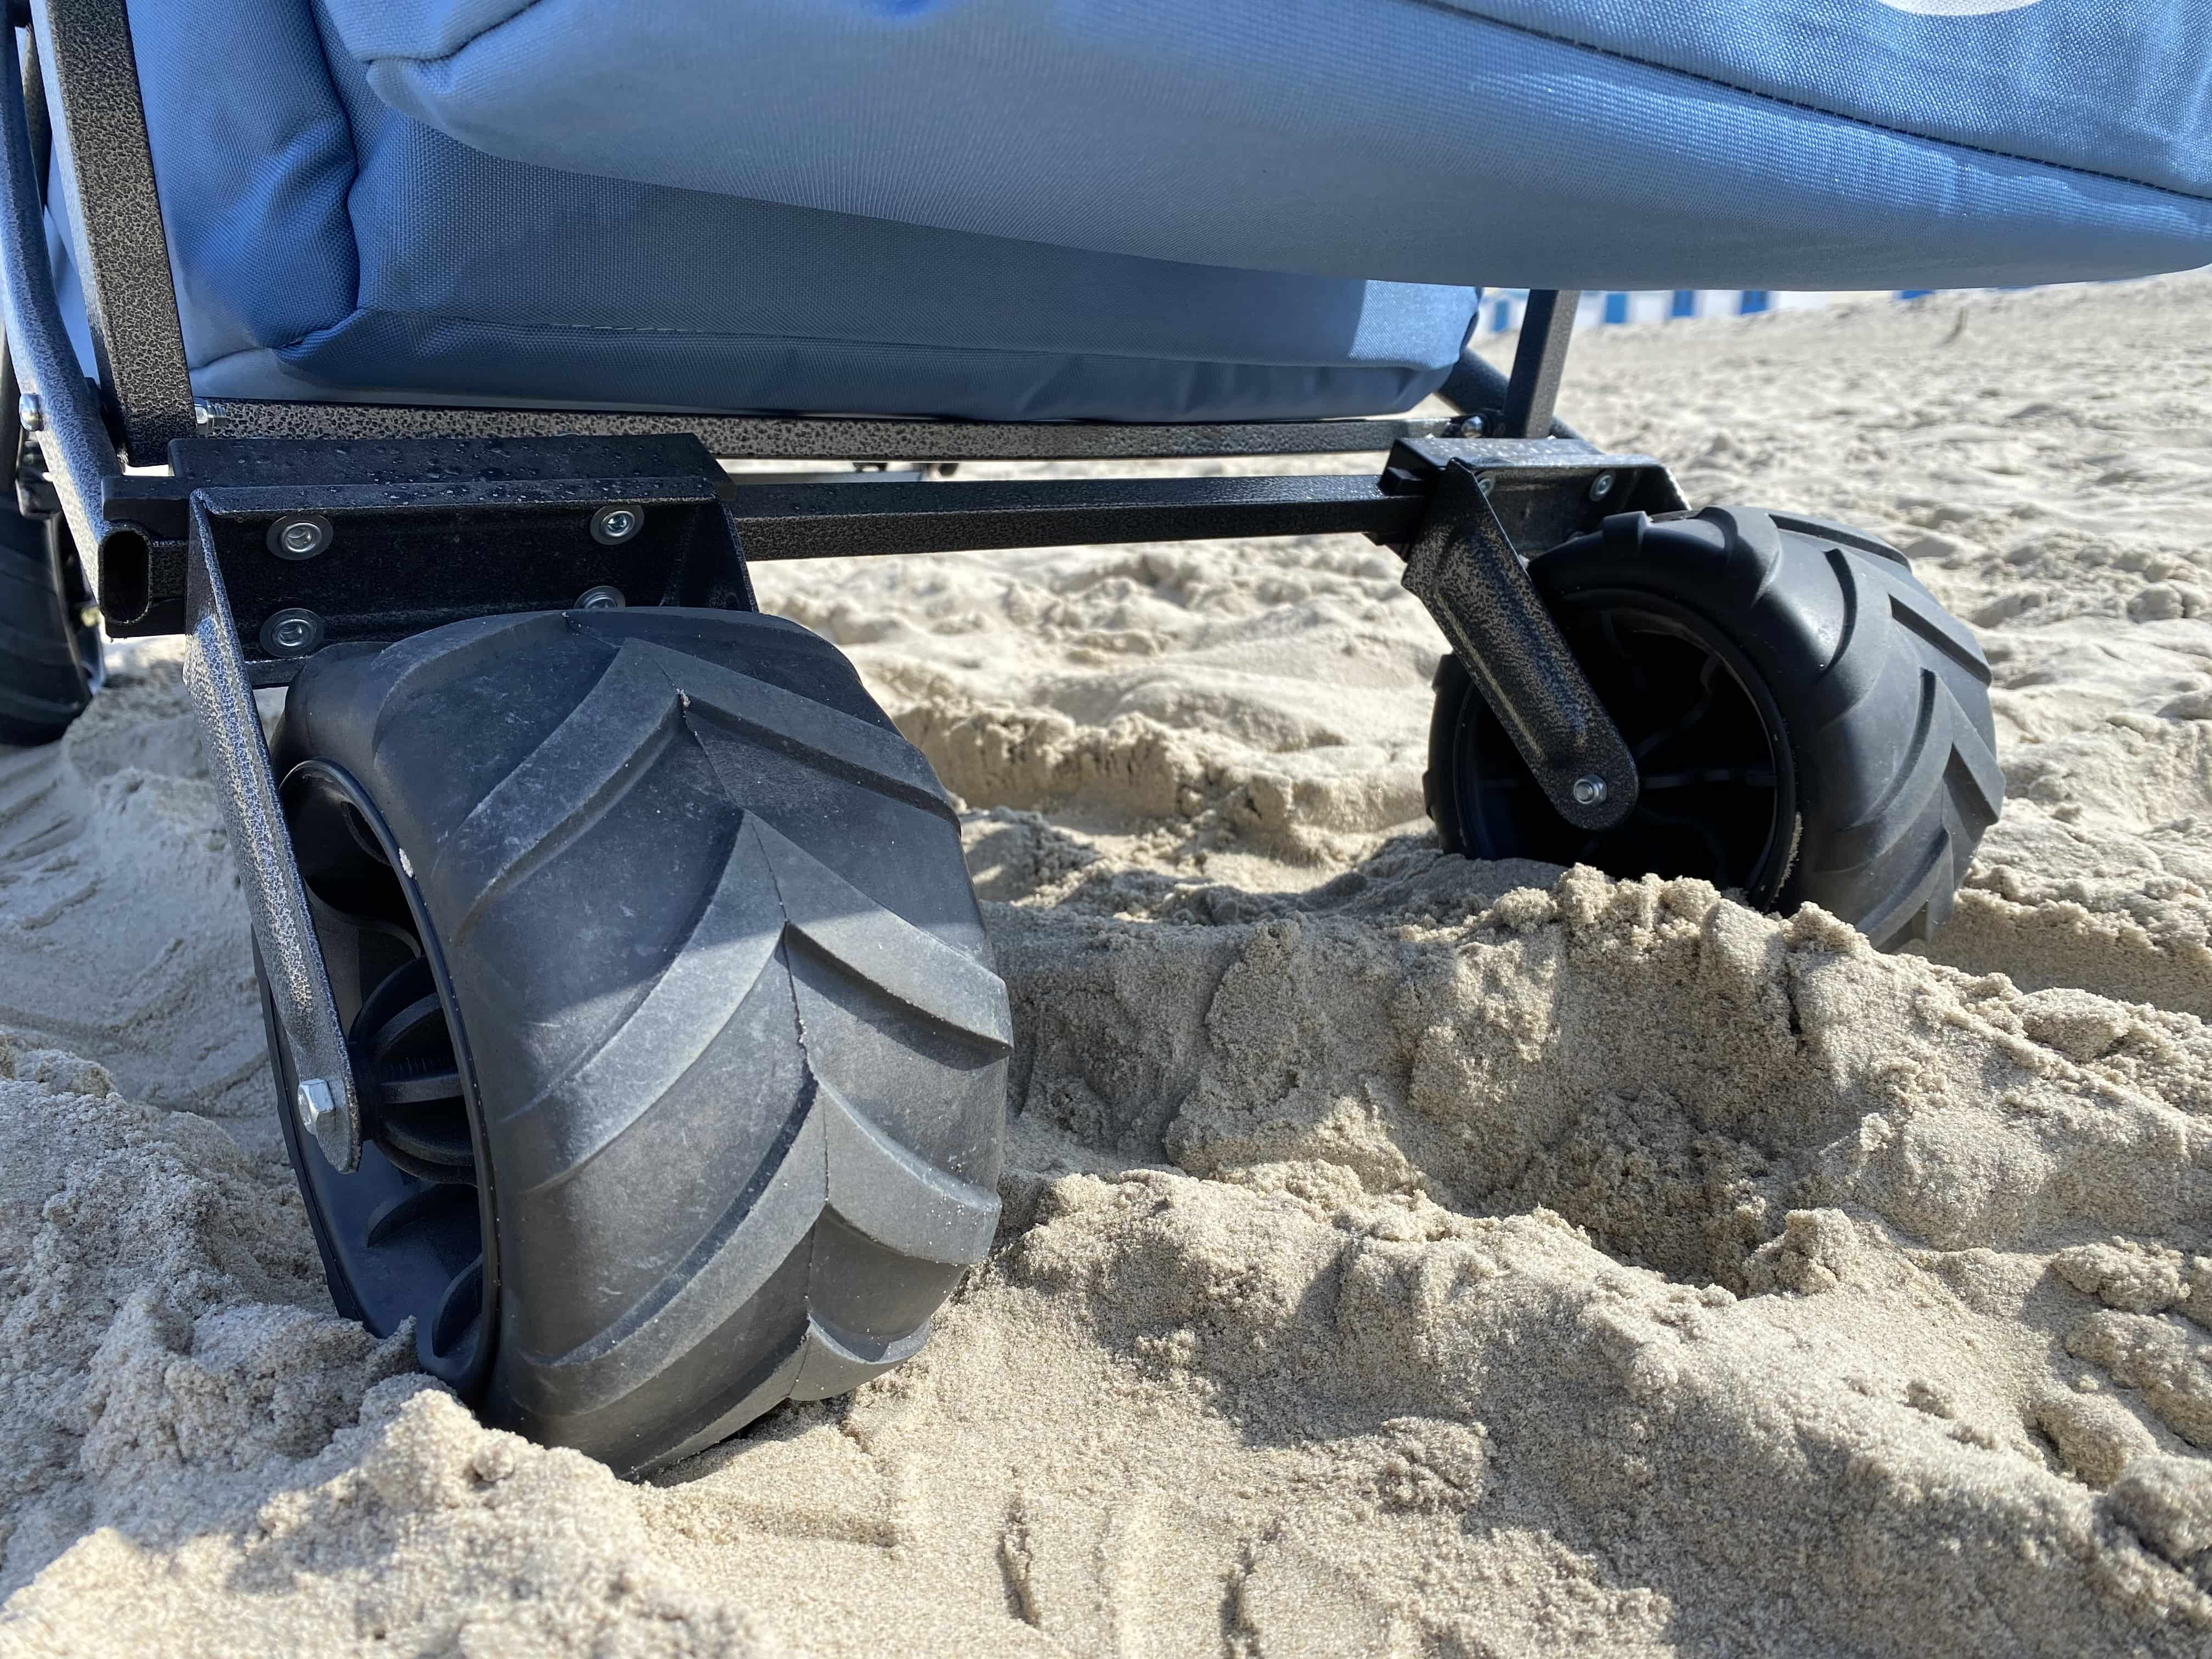 Maxplus Opvouwbare Bolderkar Beach met dak 138x56x110 cm - Grijs/Roze